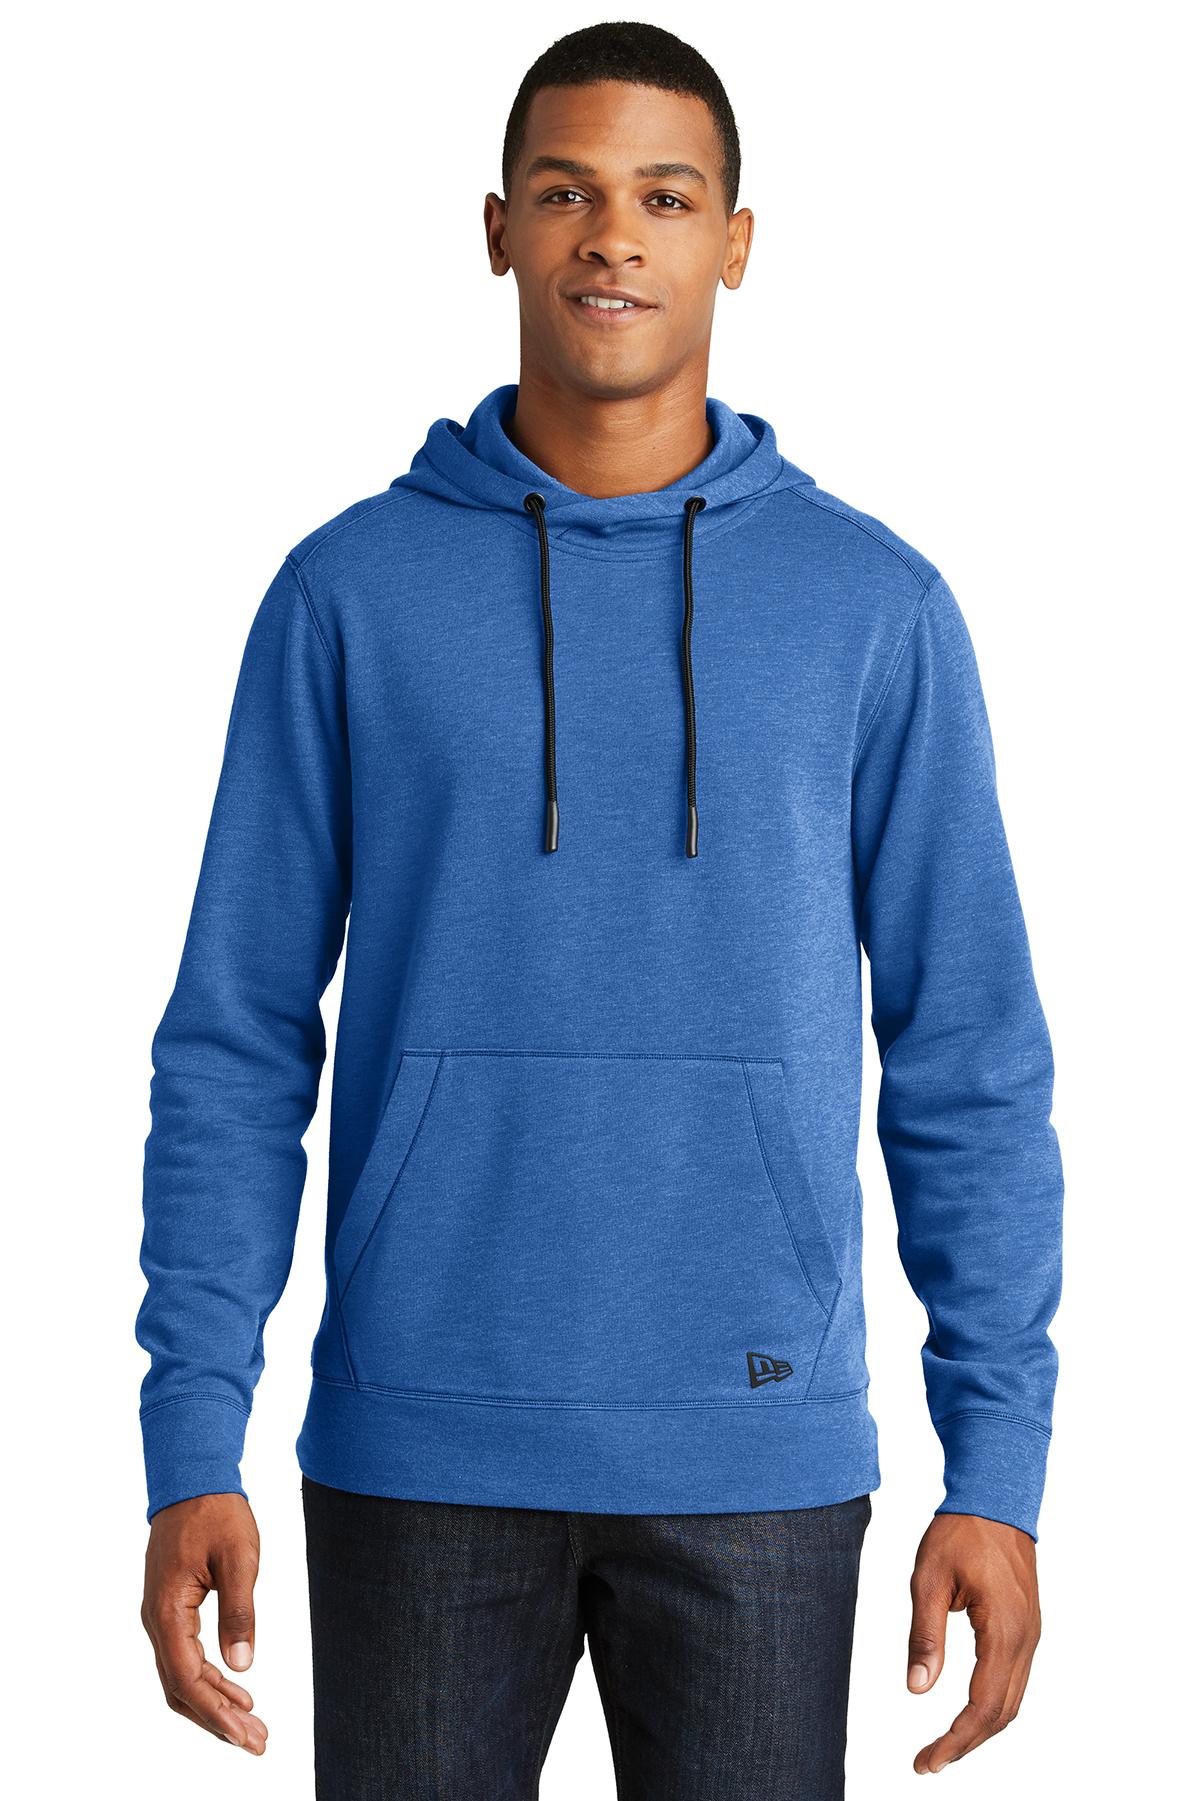 new era tri blend fleece pullover hoodie hoodie. Black Bedroom Furniture Sets. Home Design Ideas